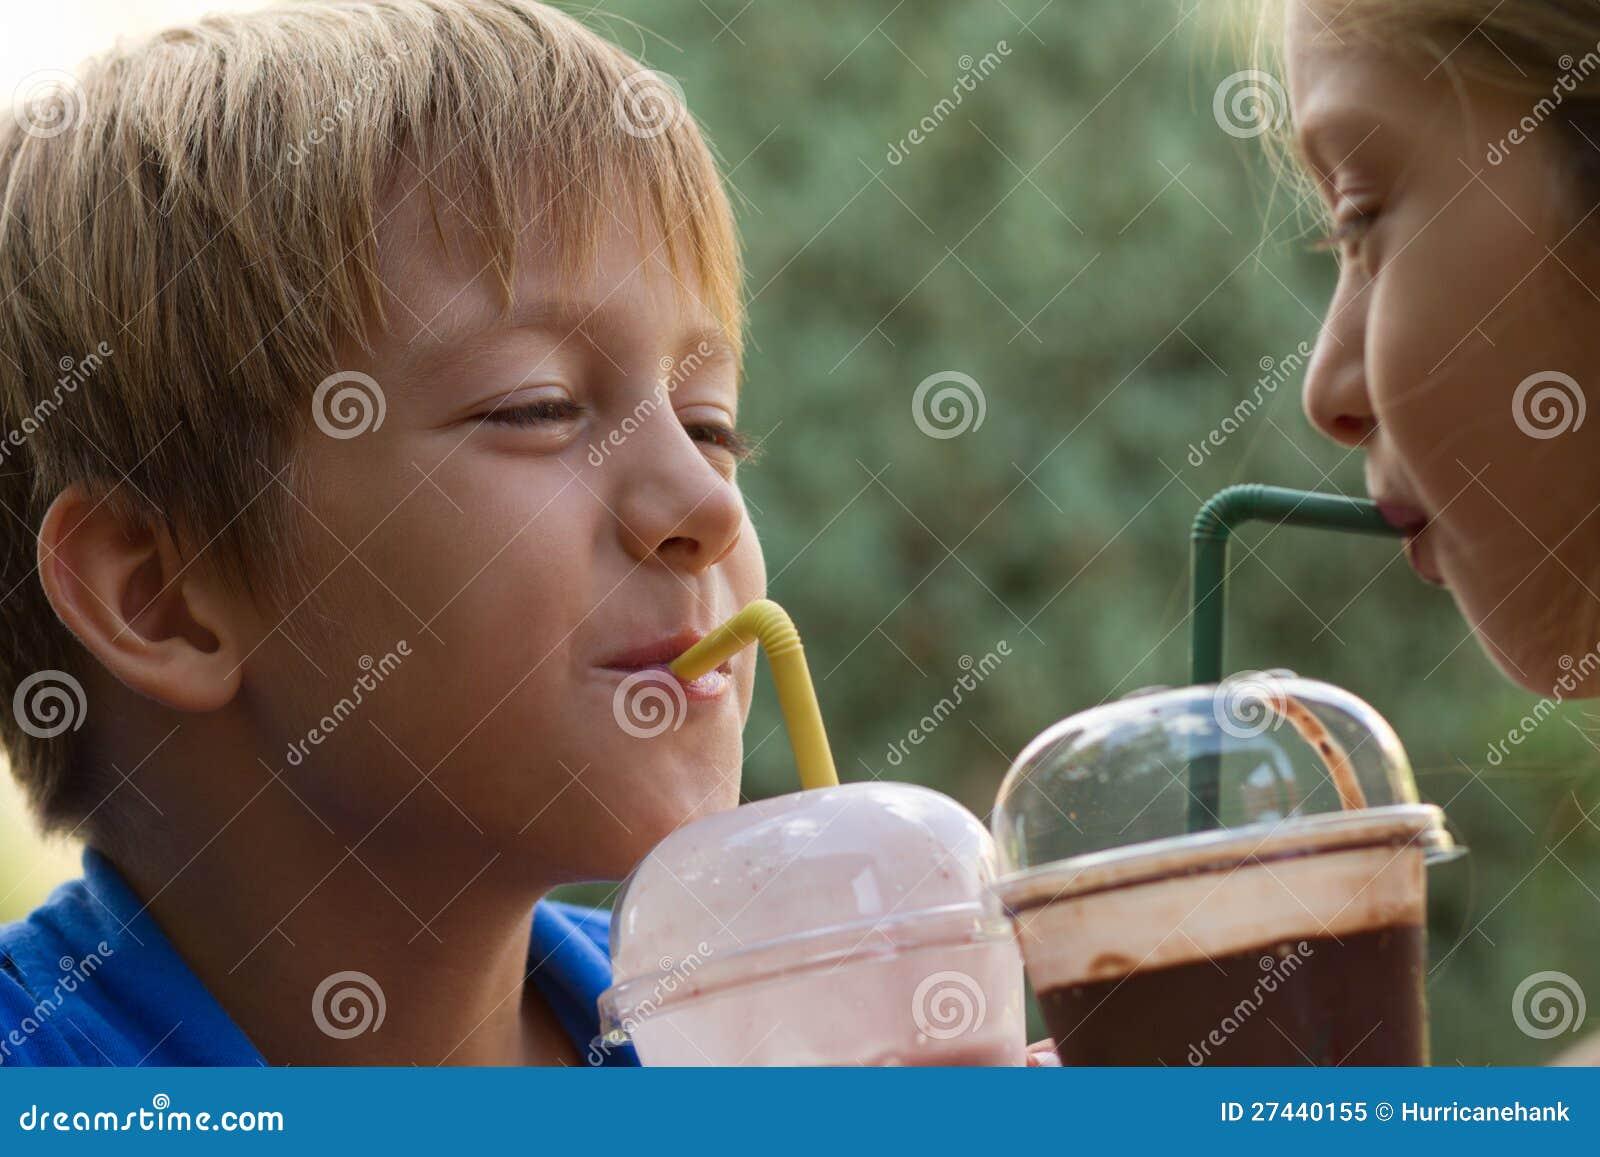 funny little kids - photo #33